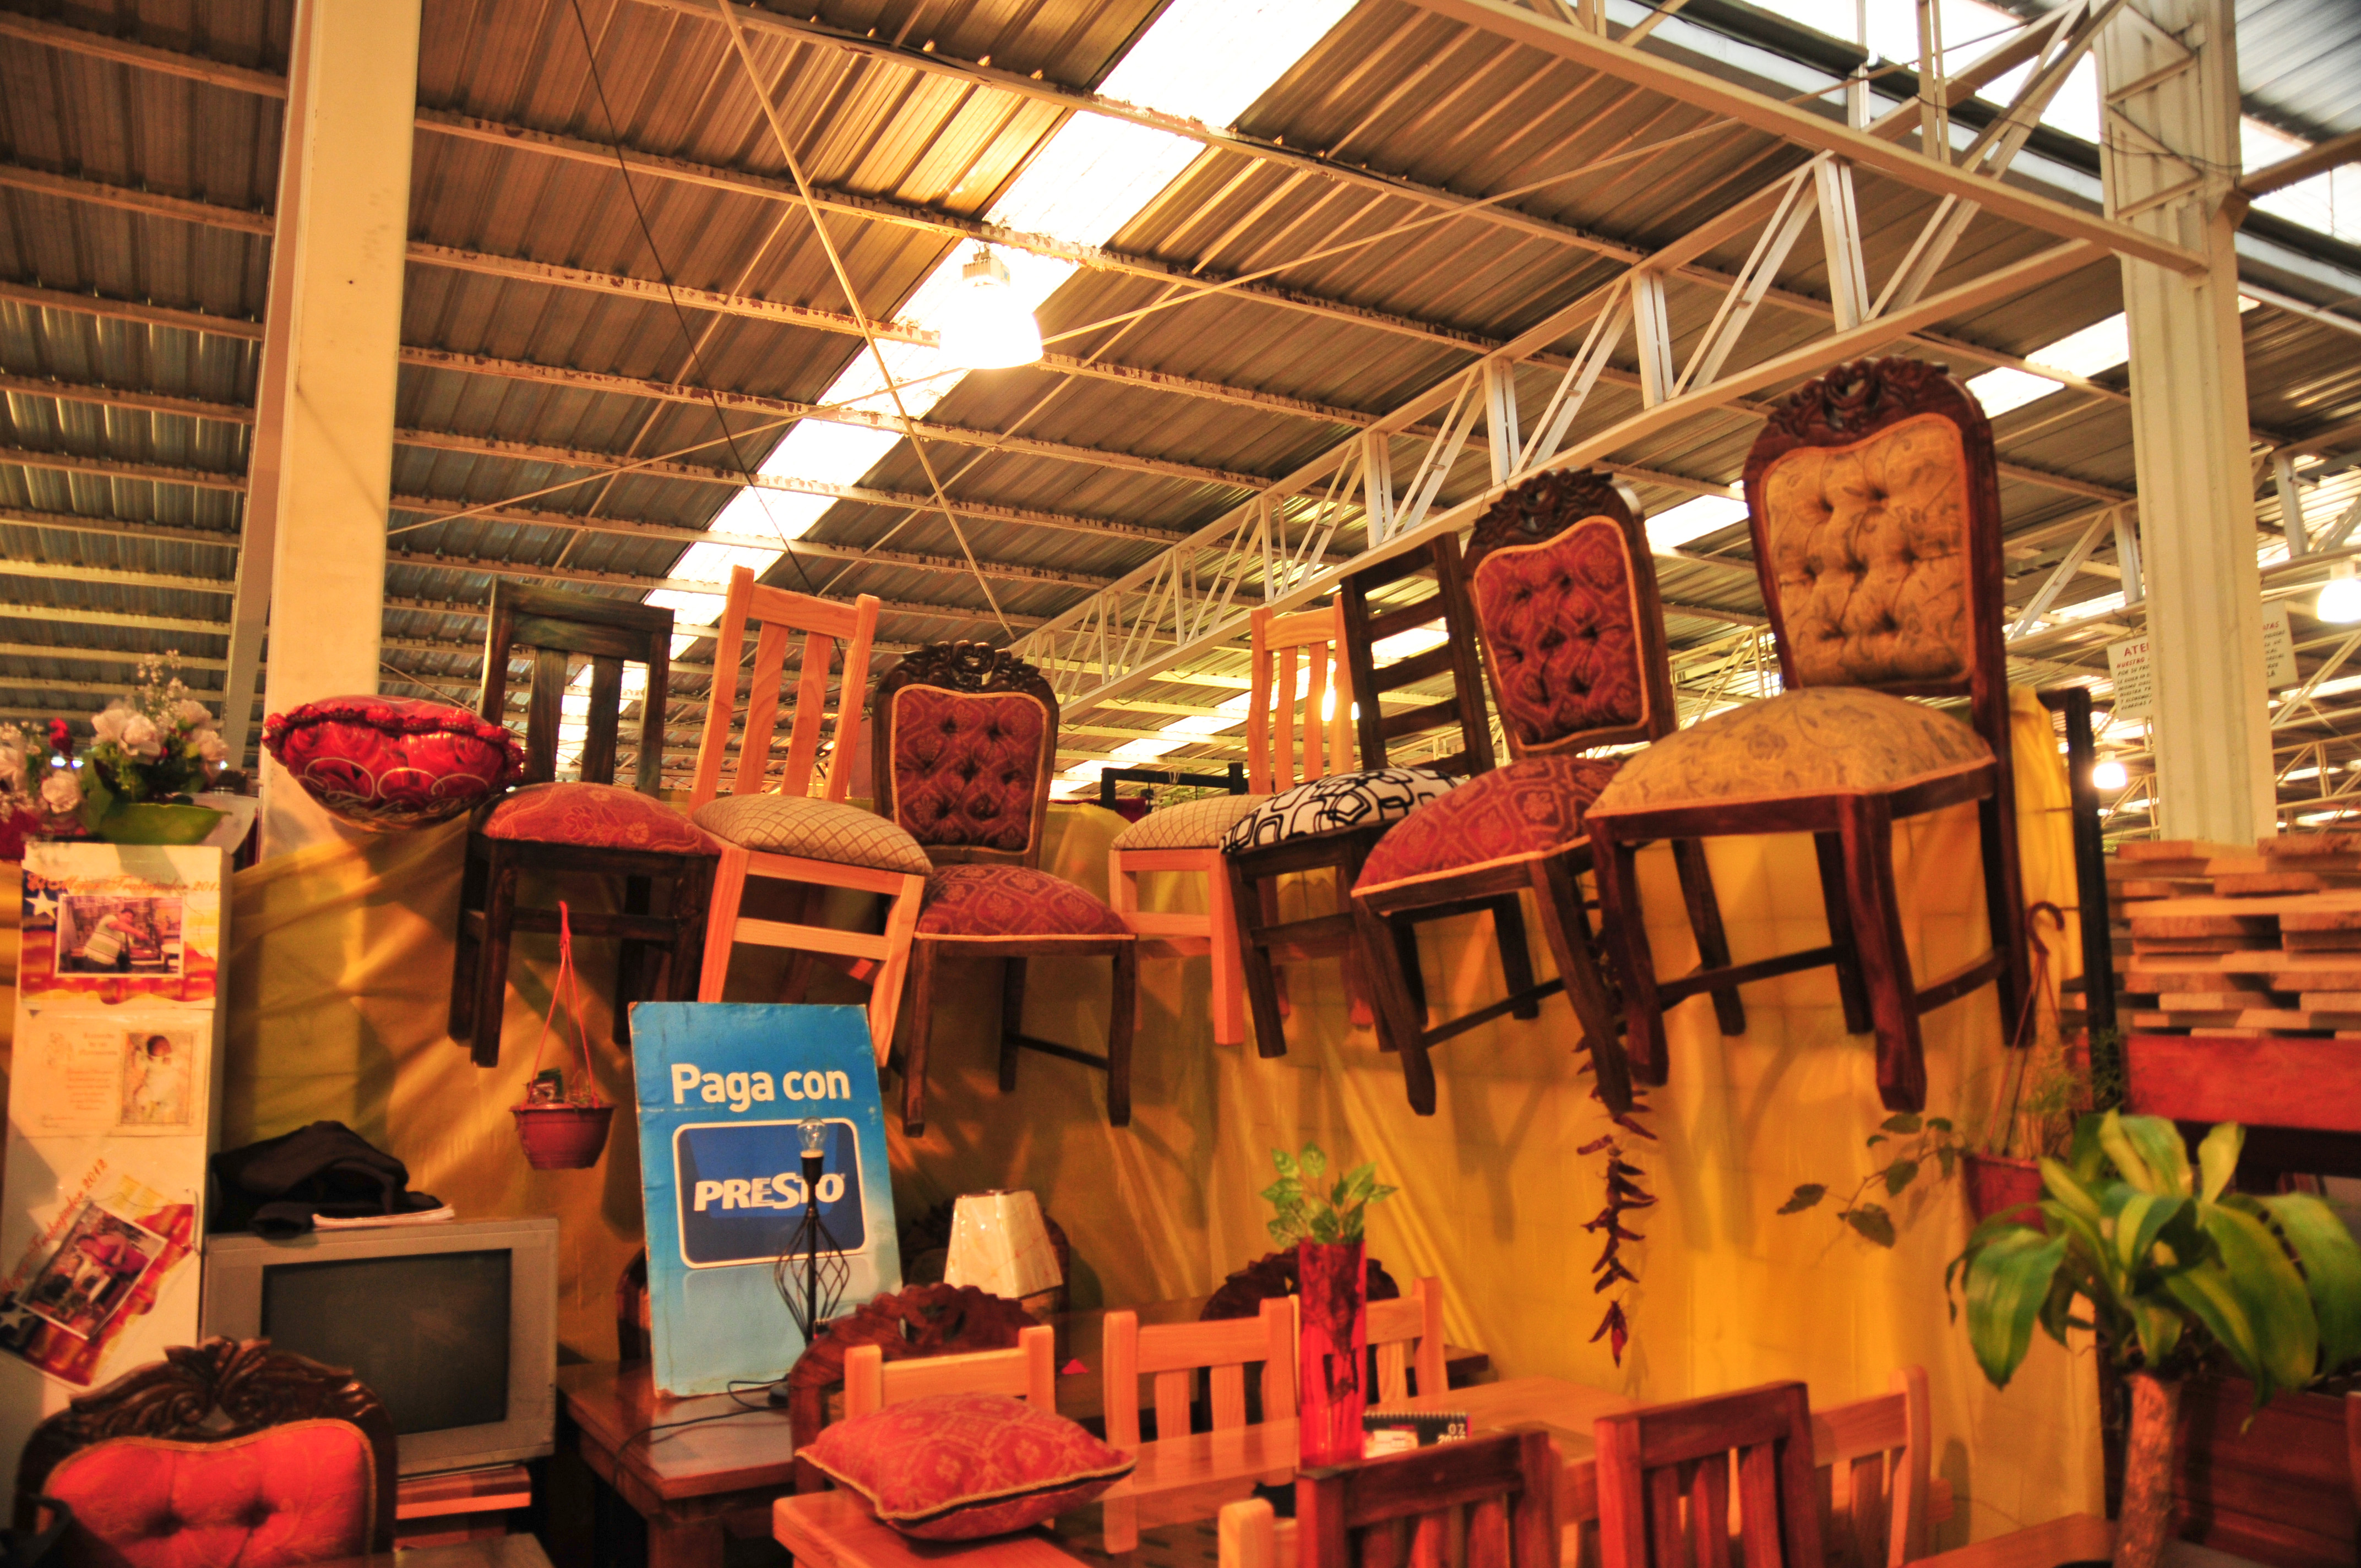 Gu a urbana de santiago barrio franklin plataforma urbana for Comedores baratos en franklin